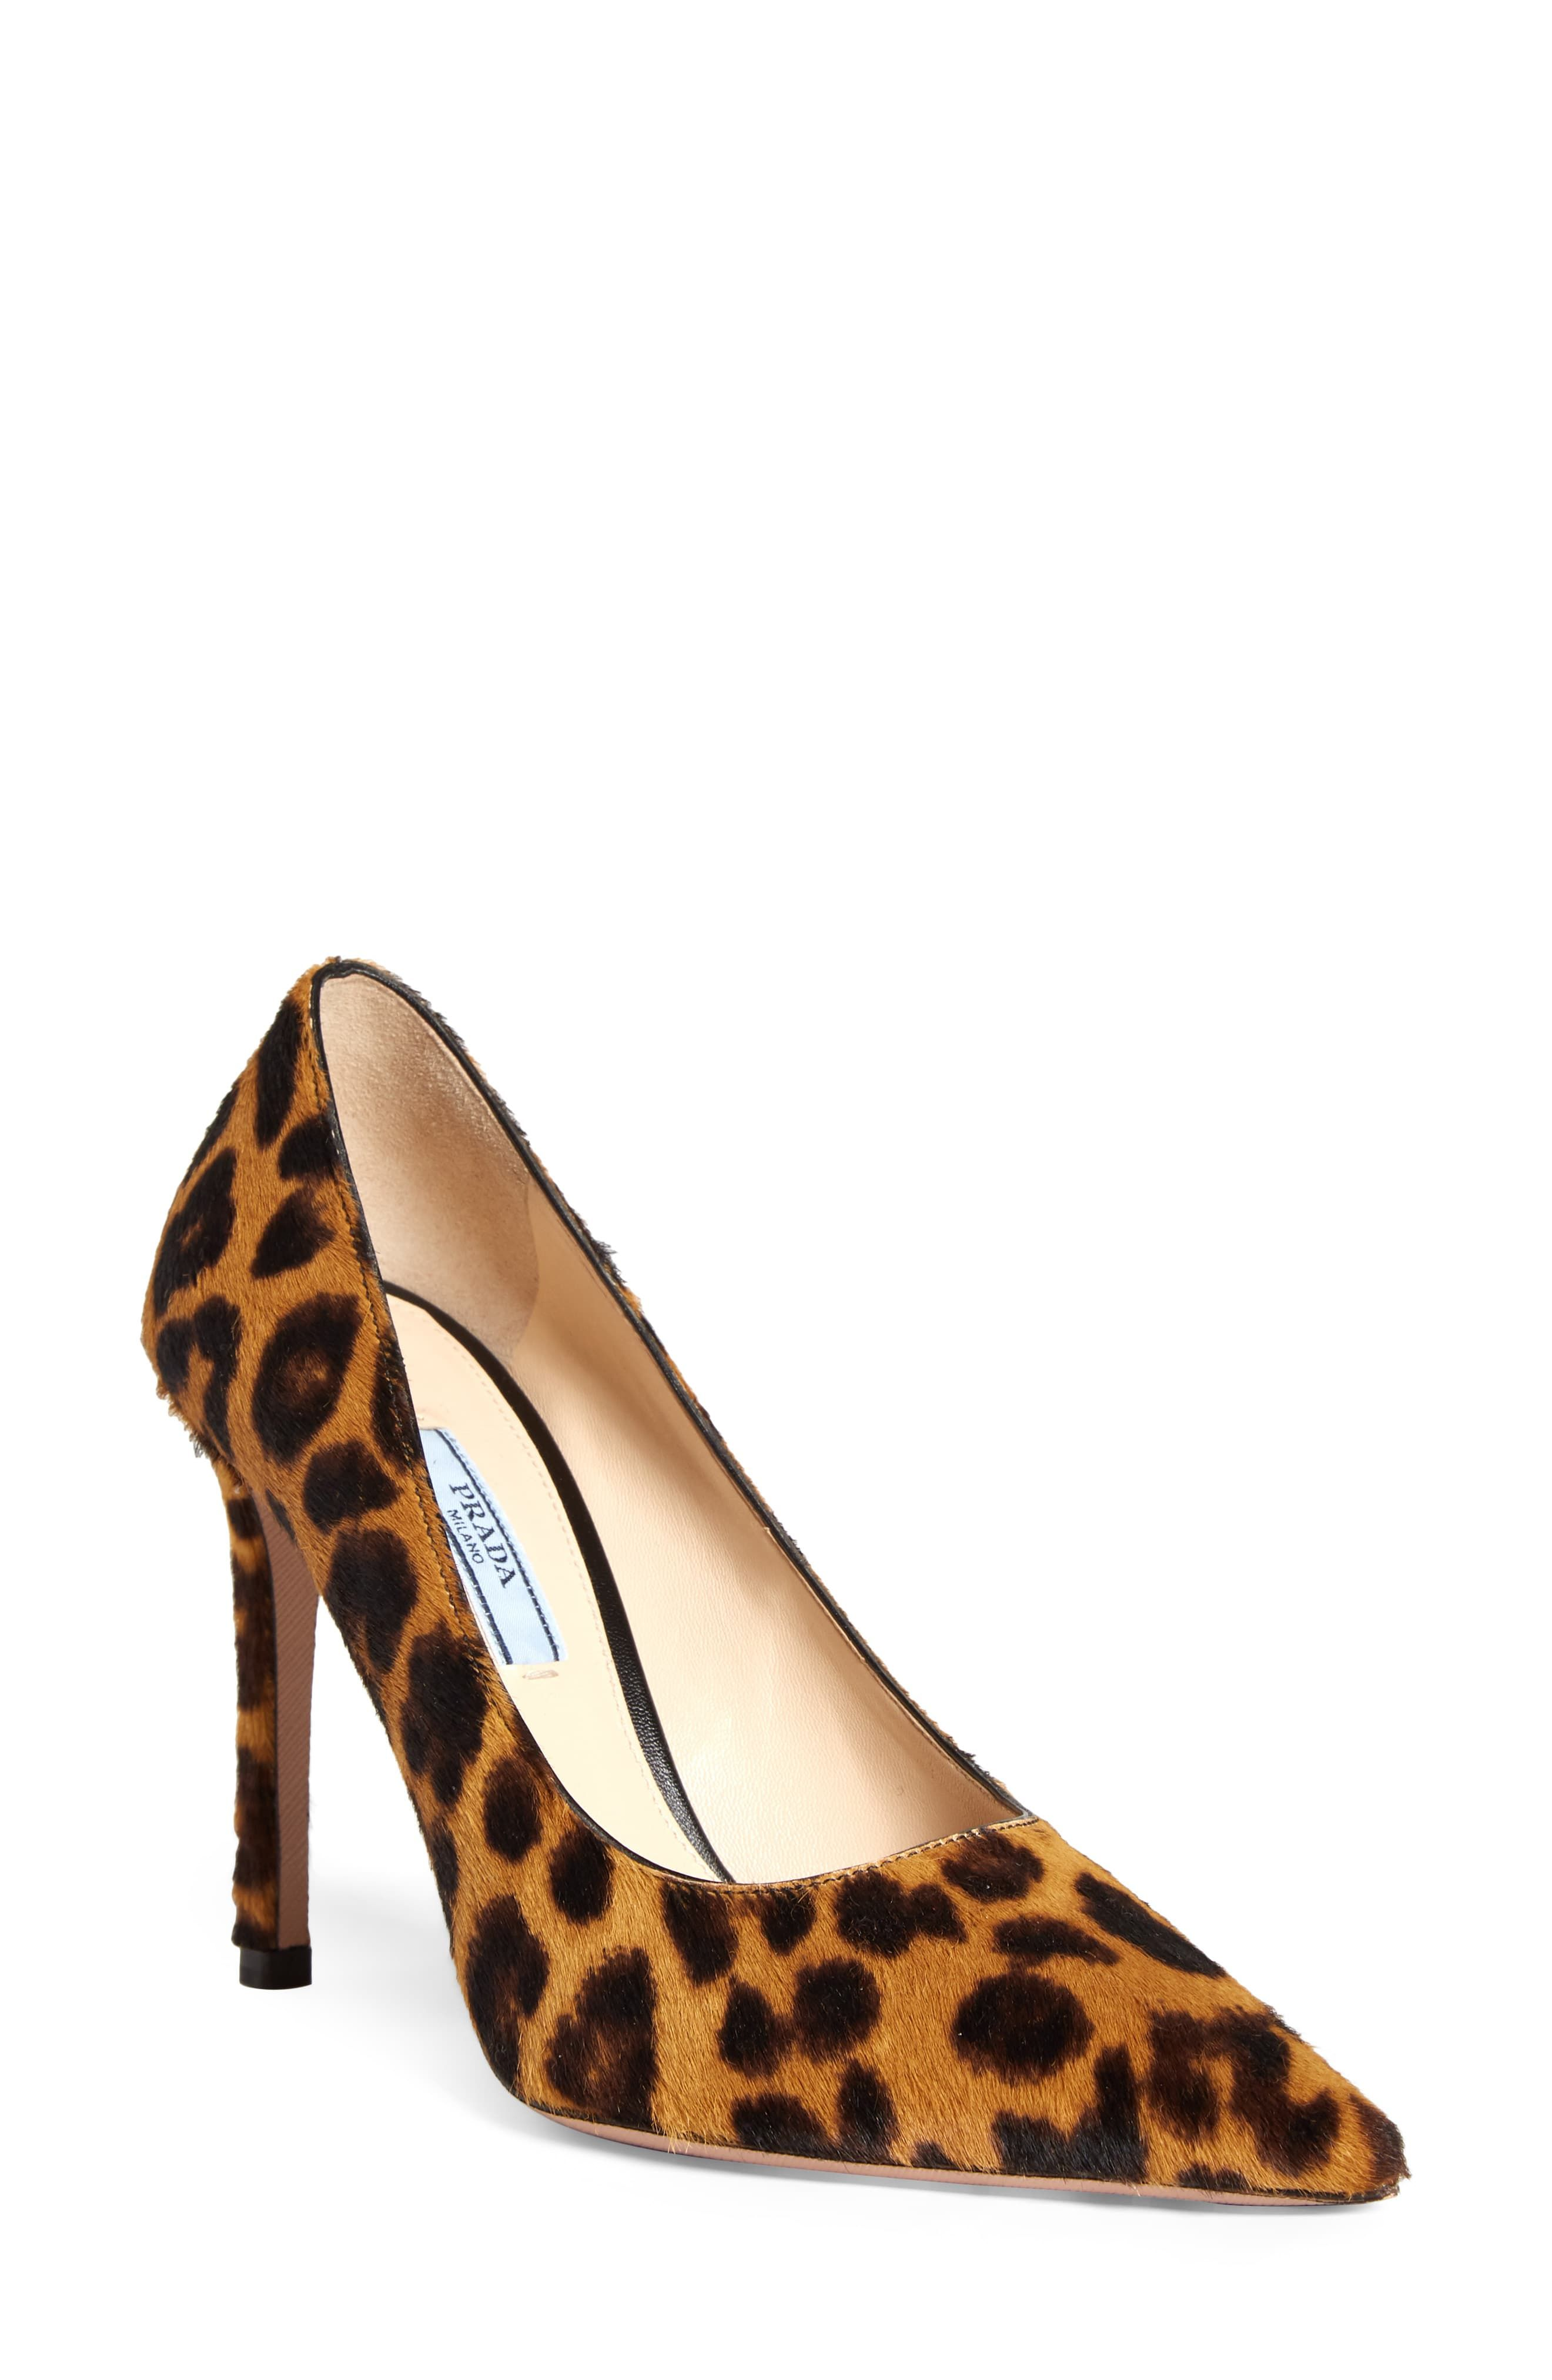 c50db4b596c Women's Prada Leopard Print Genuine Calf Hair Pointy Toe Pump, Size ...